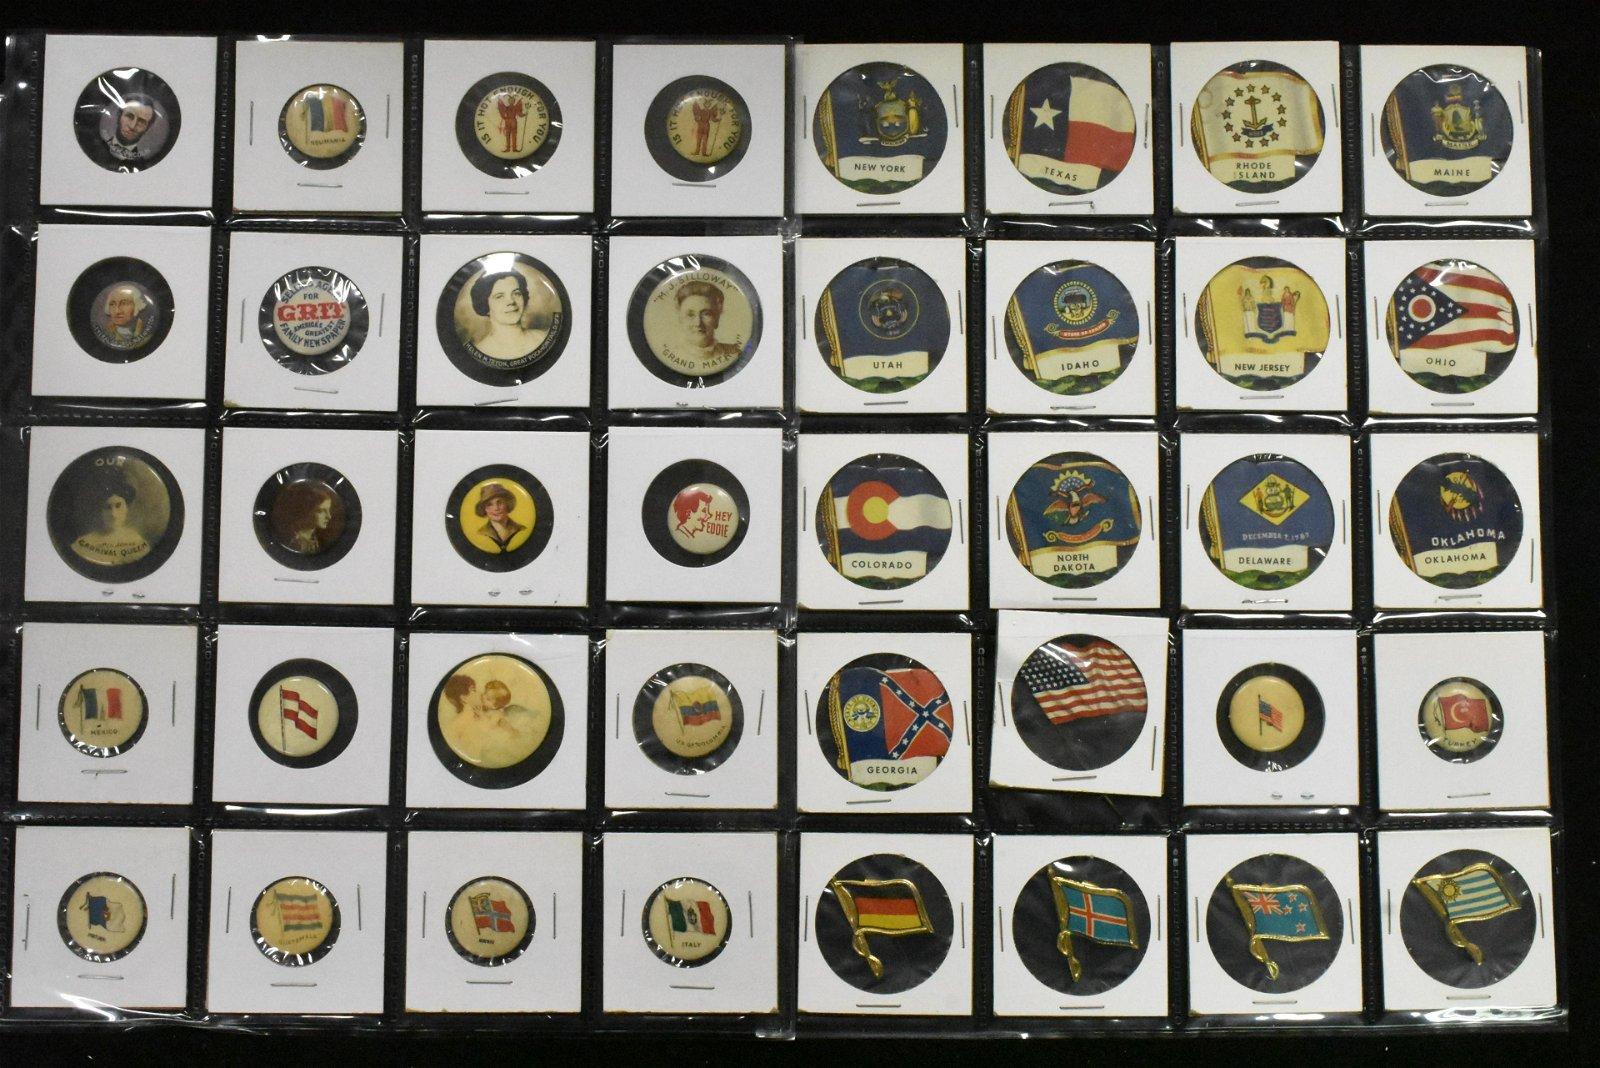 State Flag Pins, Lapel Pins and Pin Backs